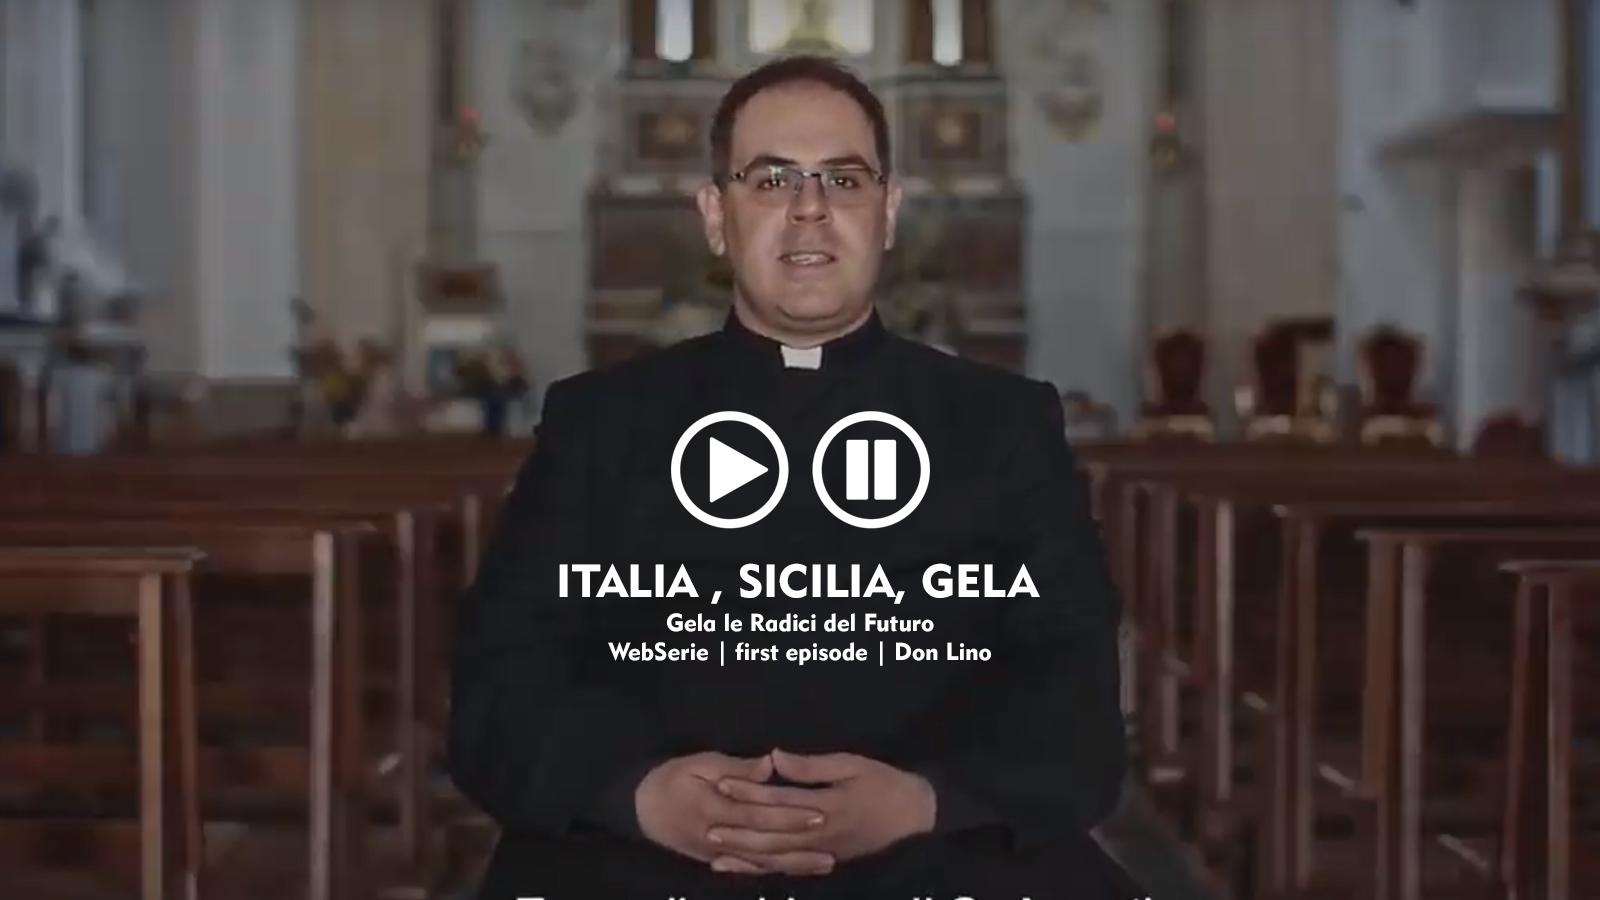 webserie | italia, sicilia, gela | first episode | don lino